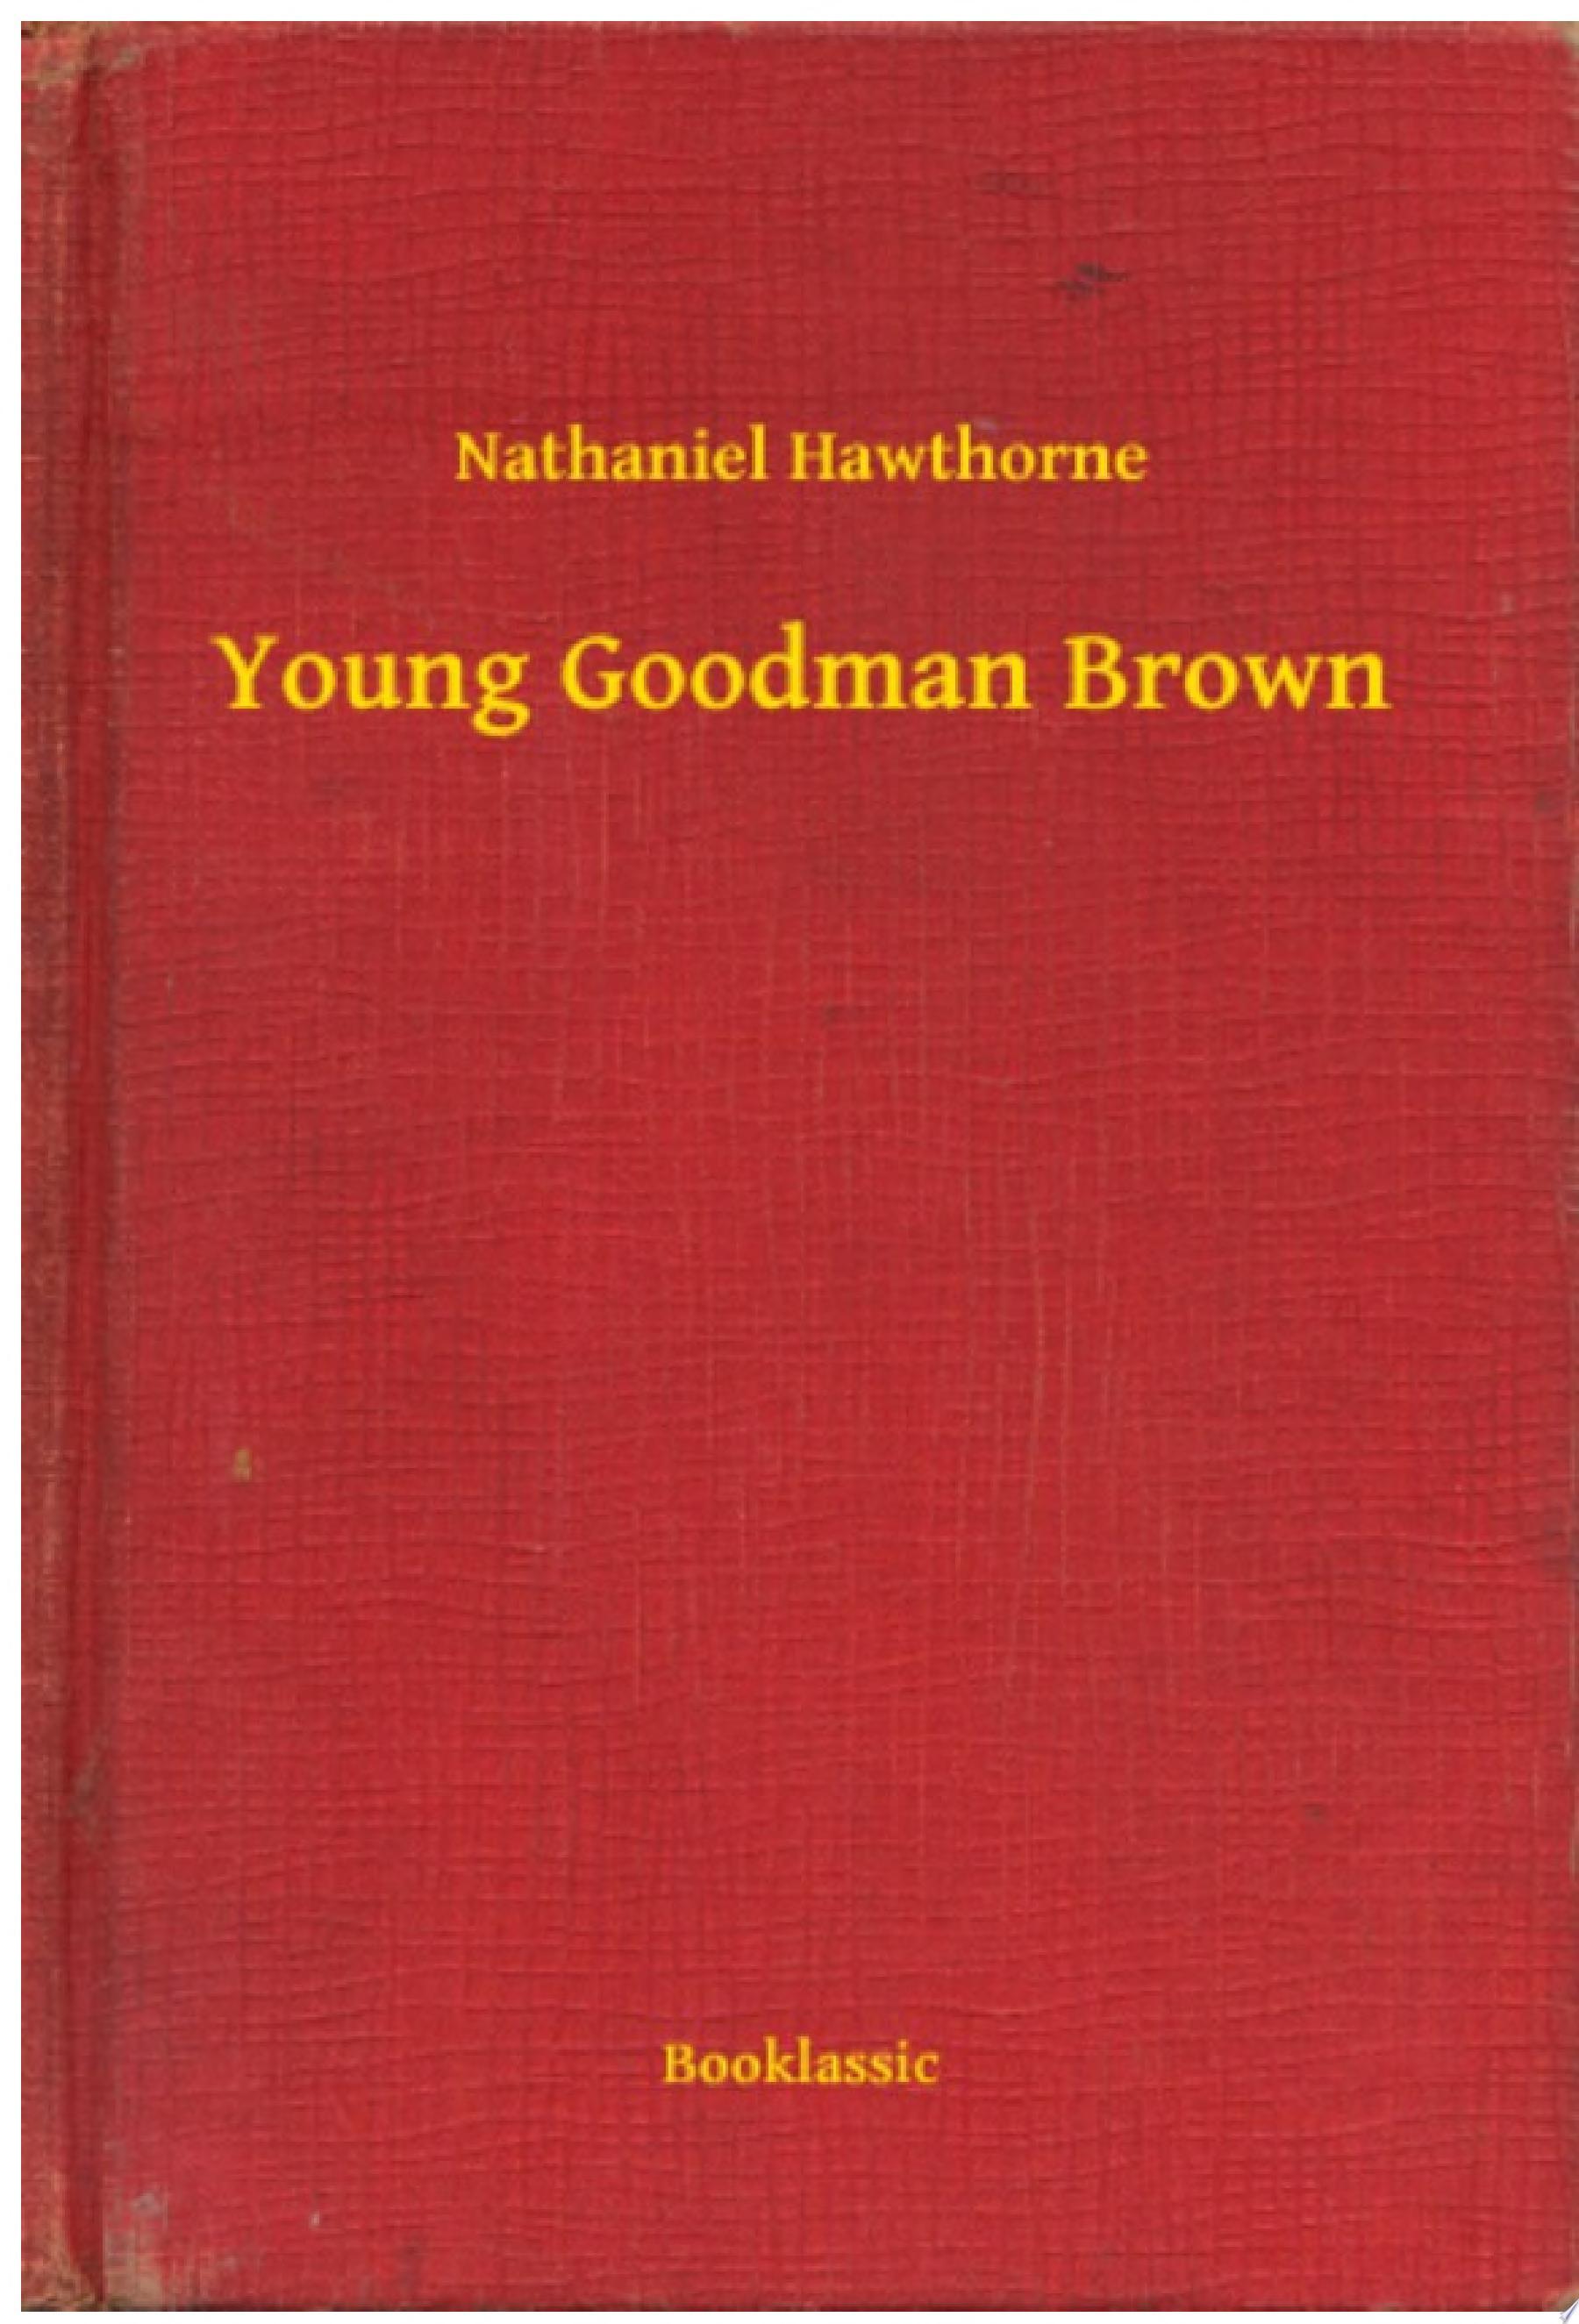 Young Goodman Brown